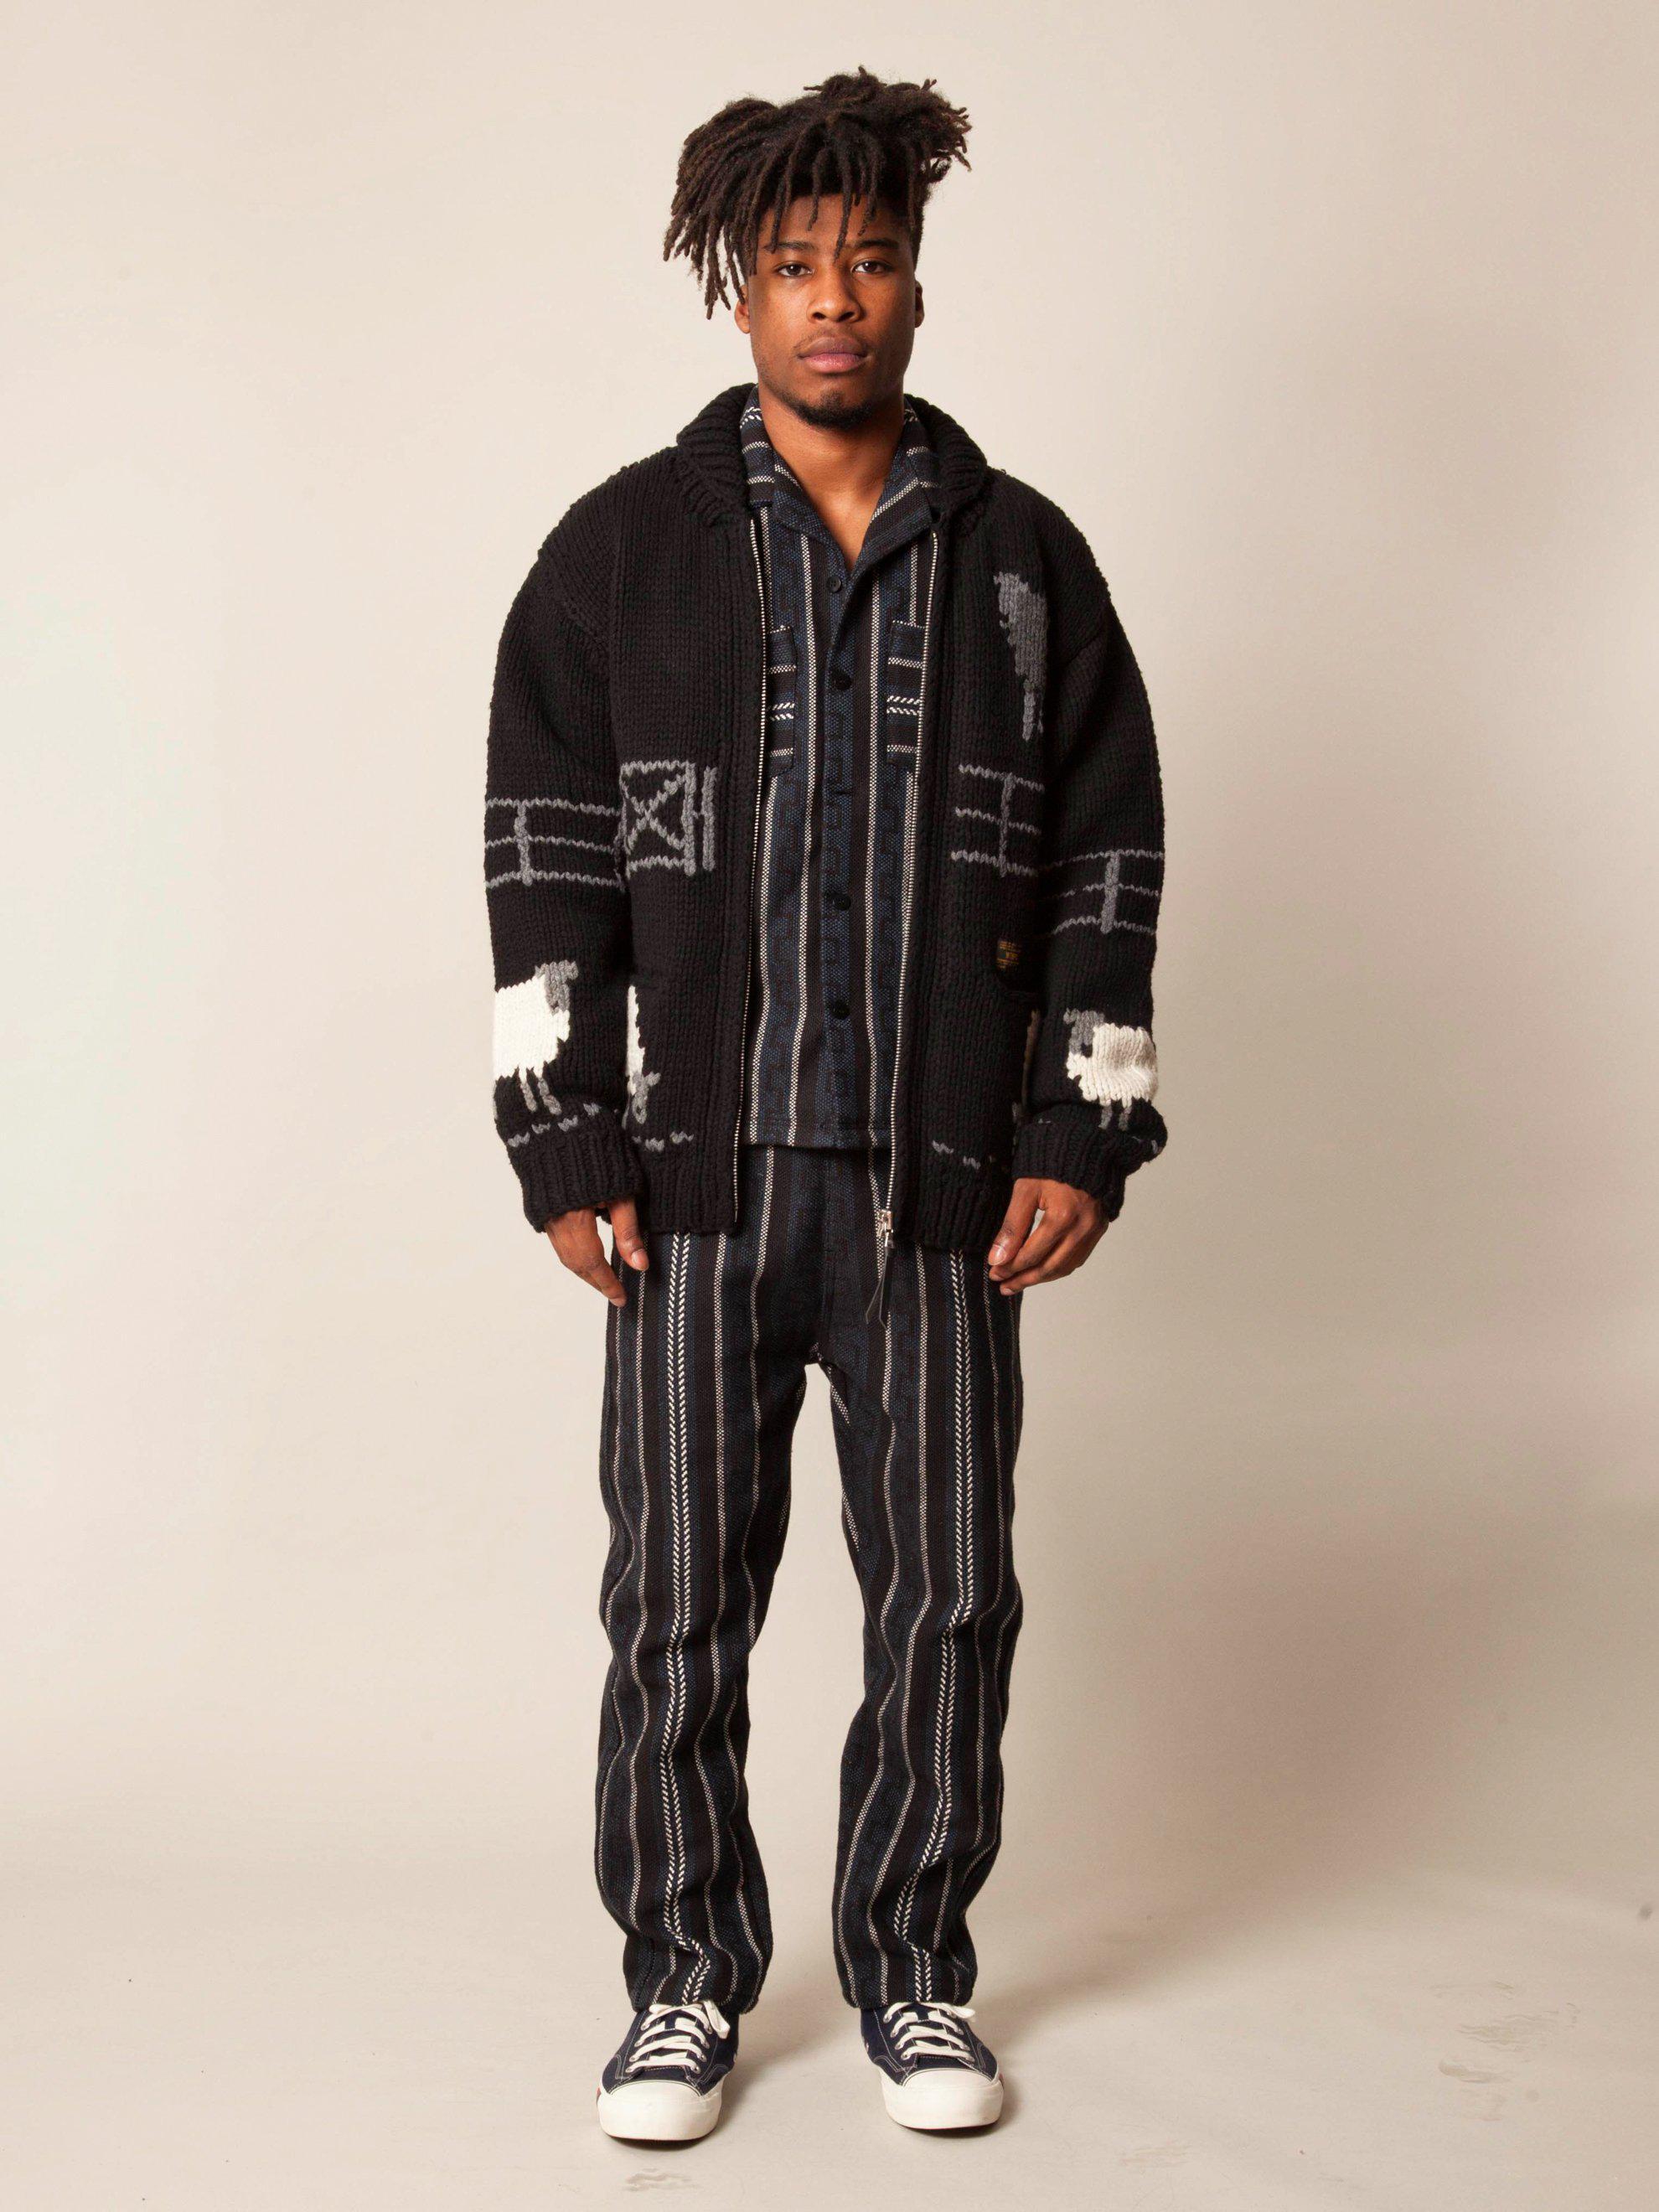 5a3ff4fe4f7 Lyst - WTAPS Cowichan Sweater in Black for Men